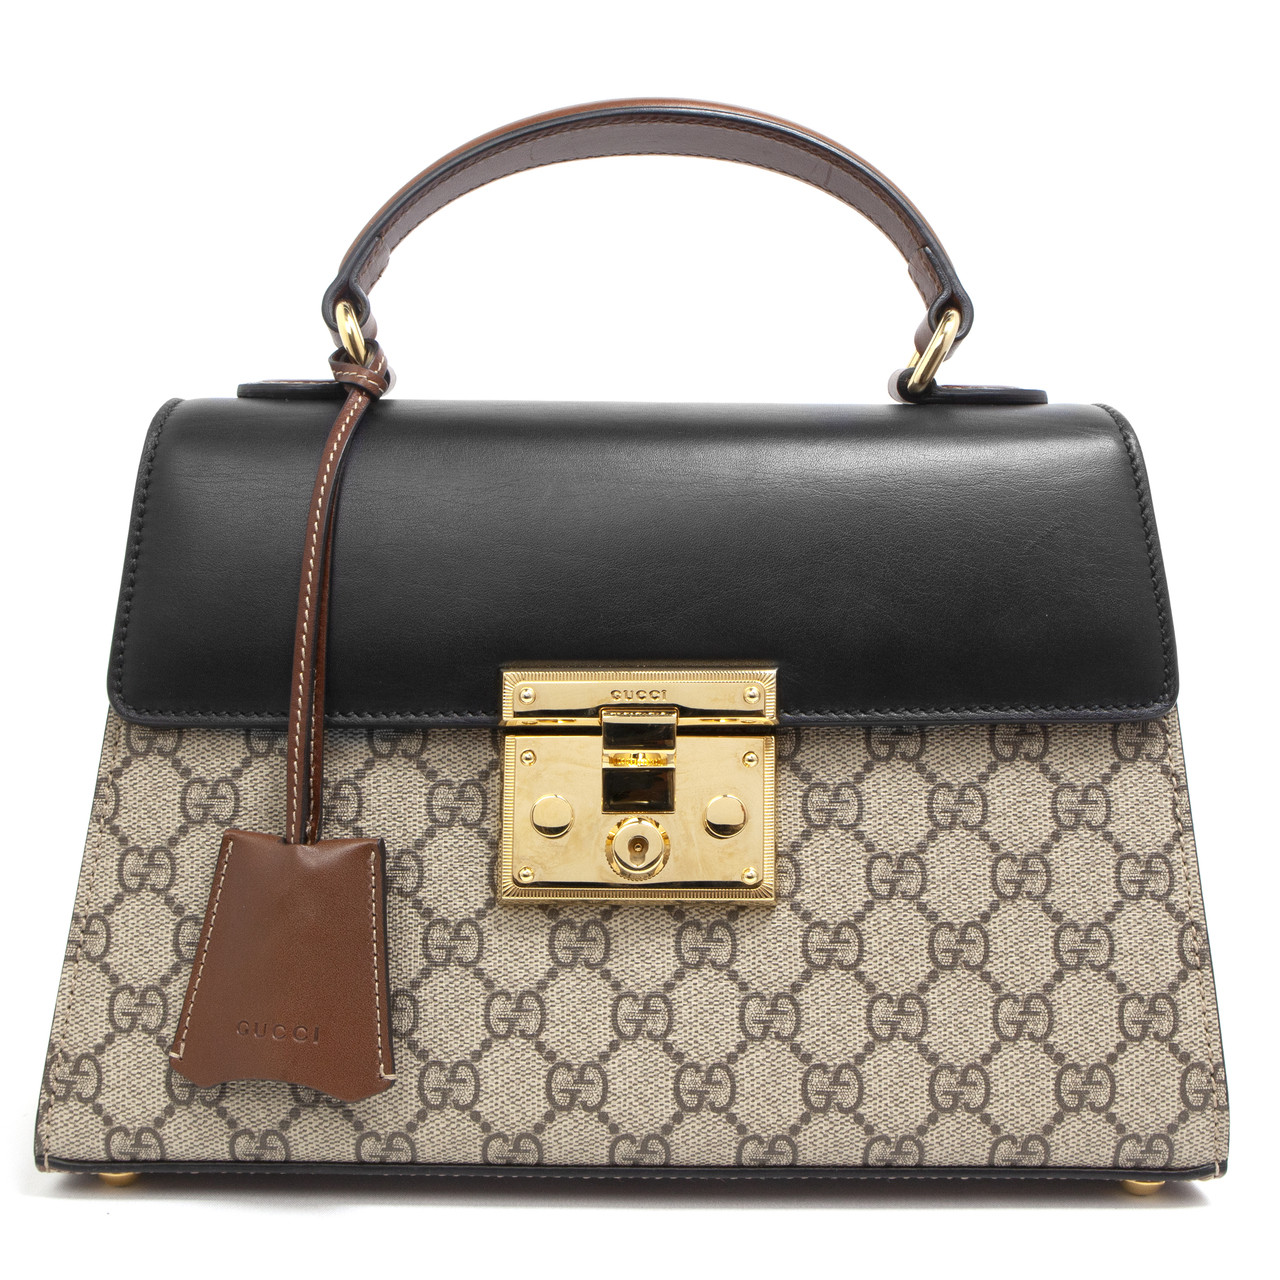 3ae05e30e022 Gucci GG Supreme Monogram Small Padlock Top Handle Bag - modaselle